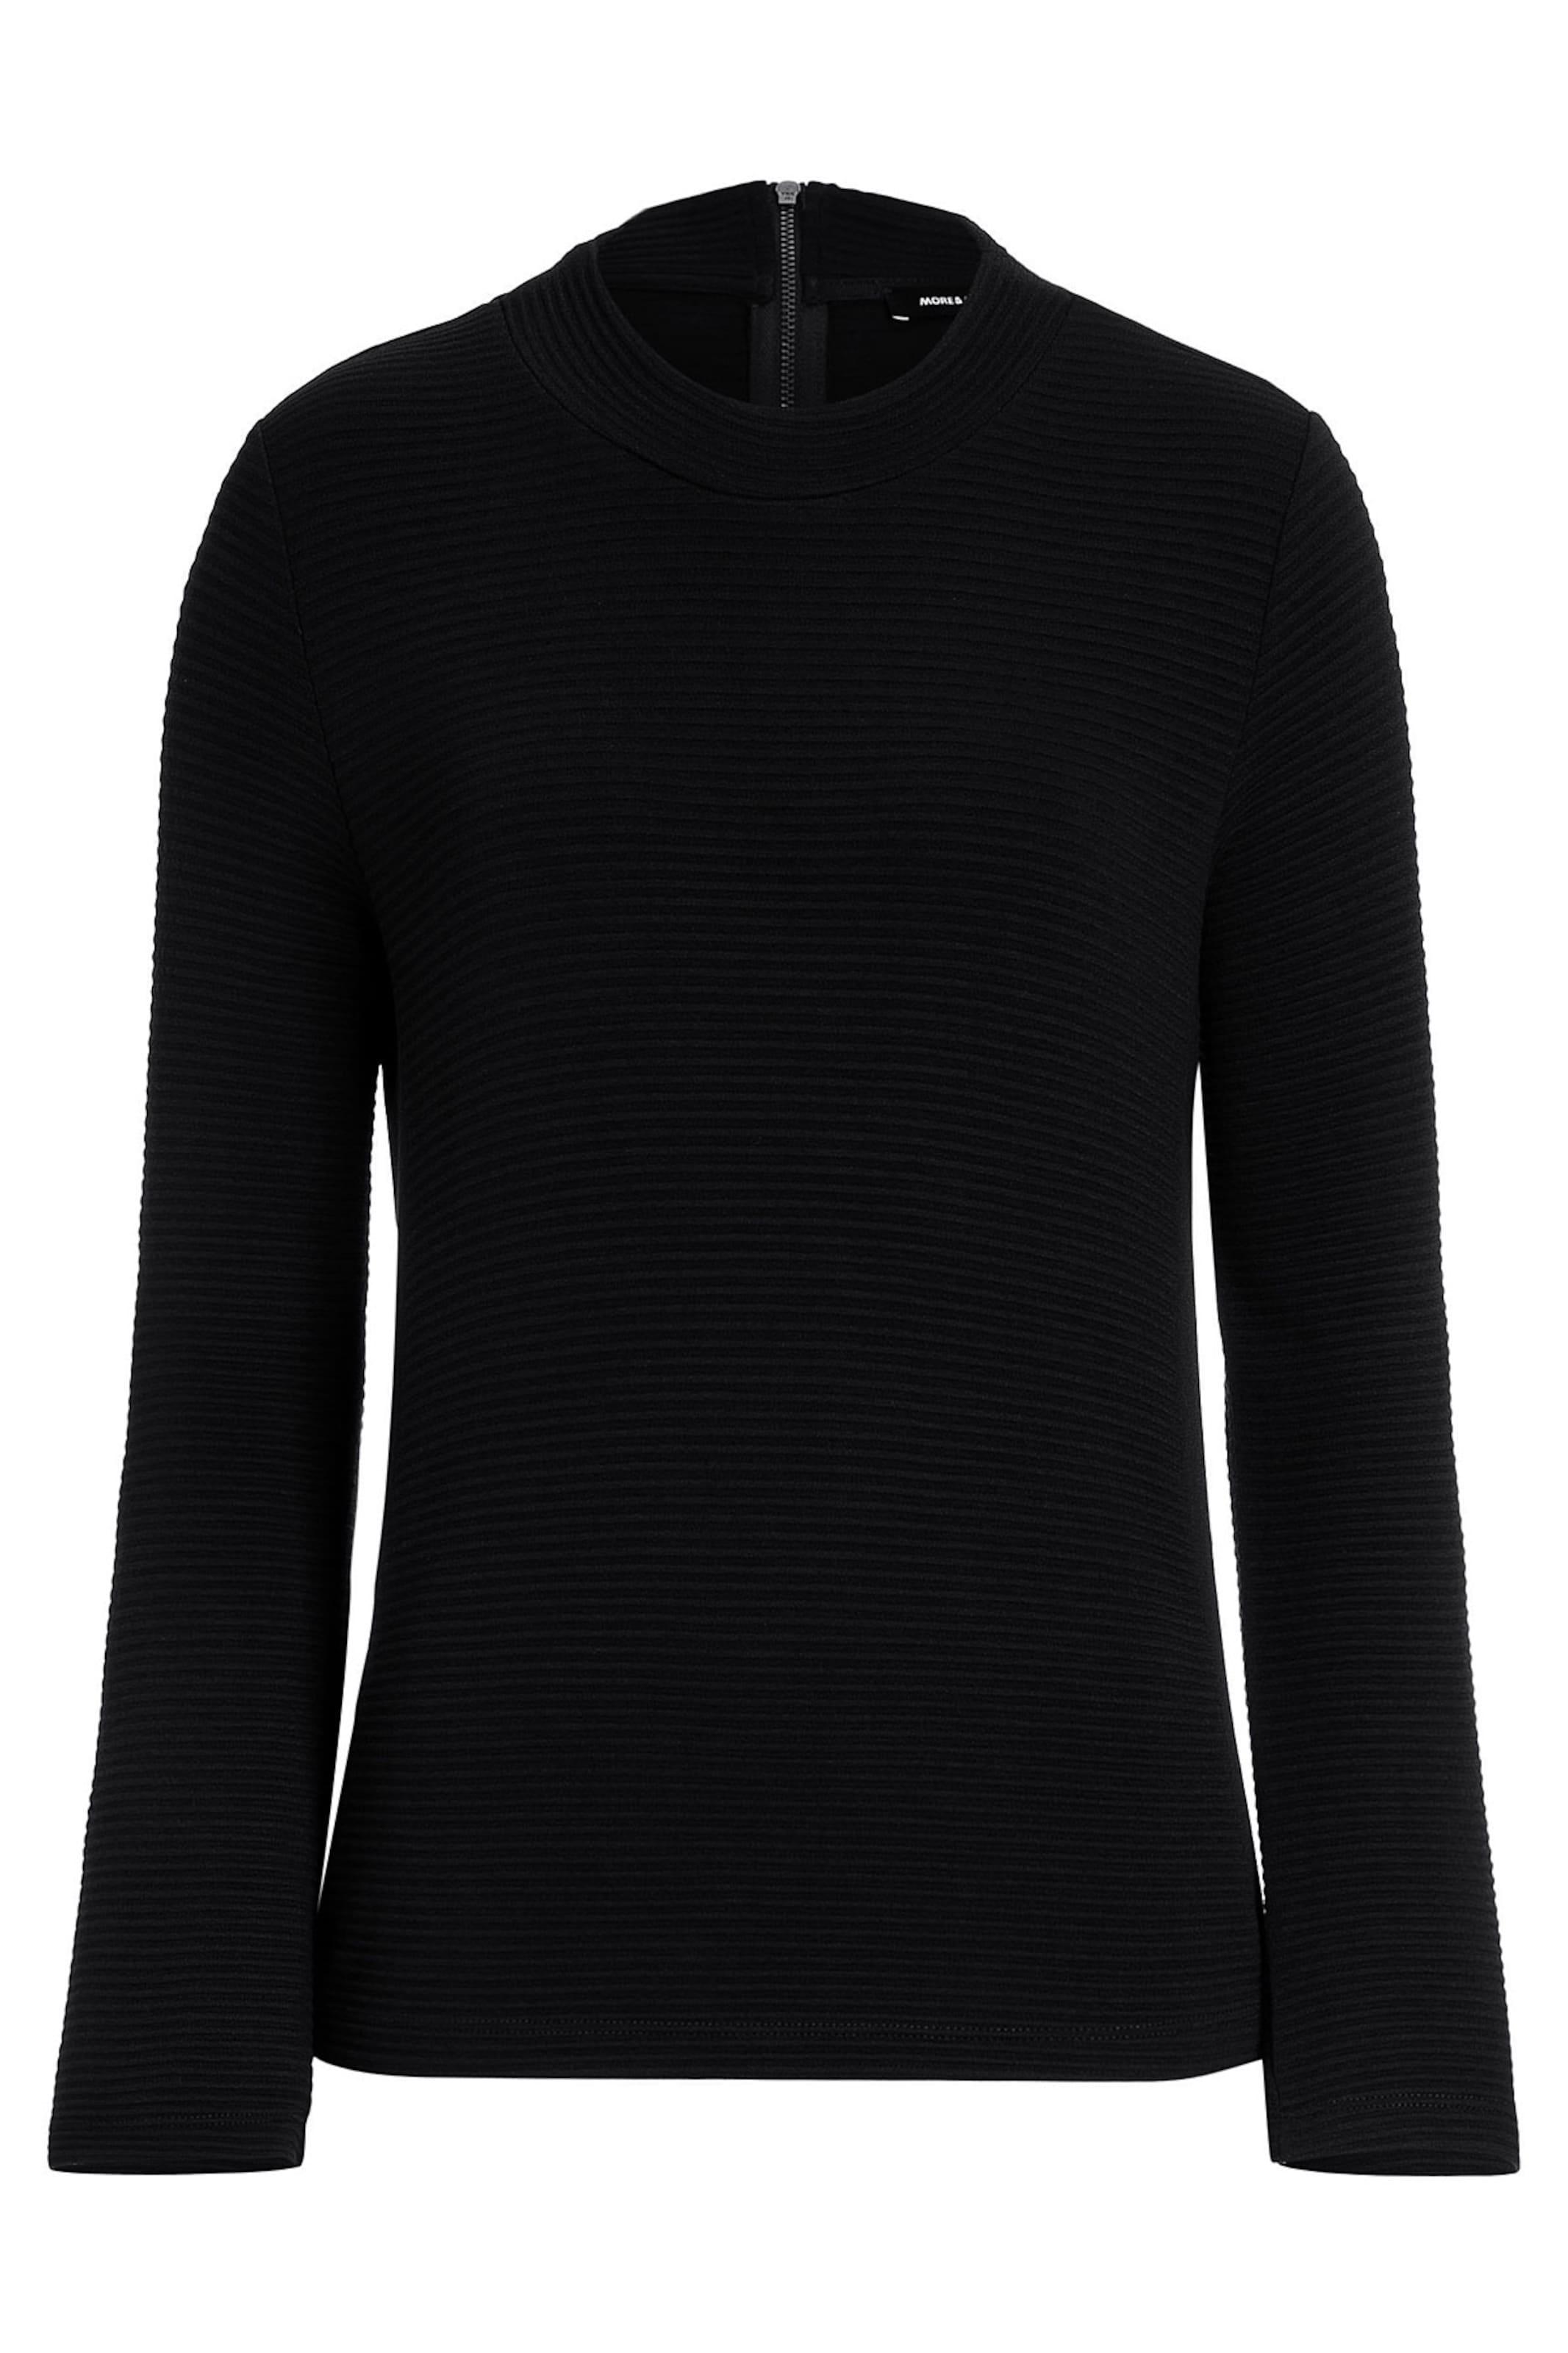 Bester Preiswerter Großhandelspreis MORE & MORE leichter Pullover Billig Online-Shop Manchester raQmBfl9DT